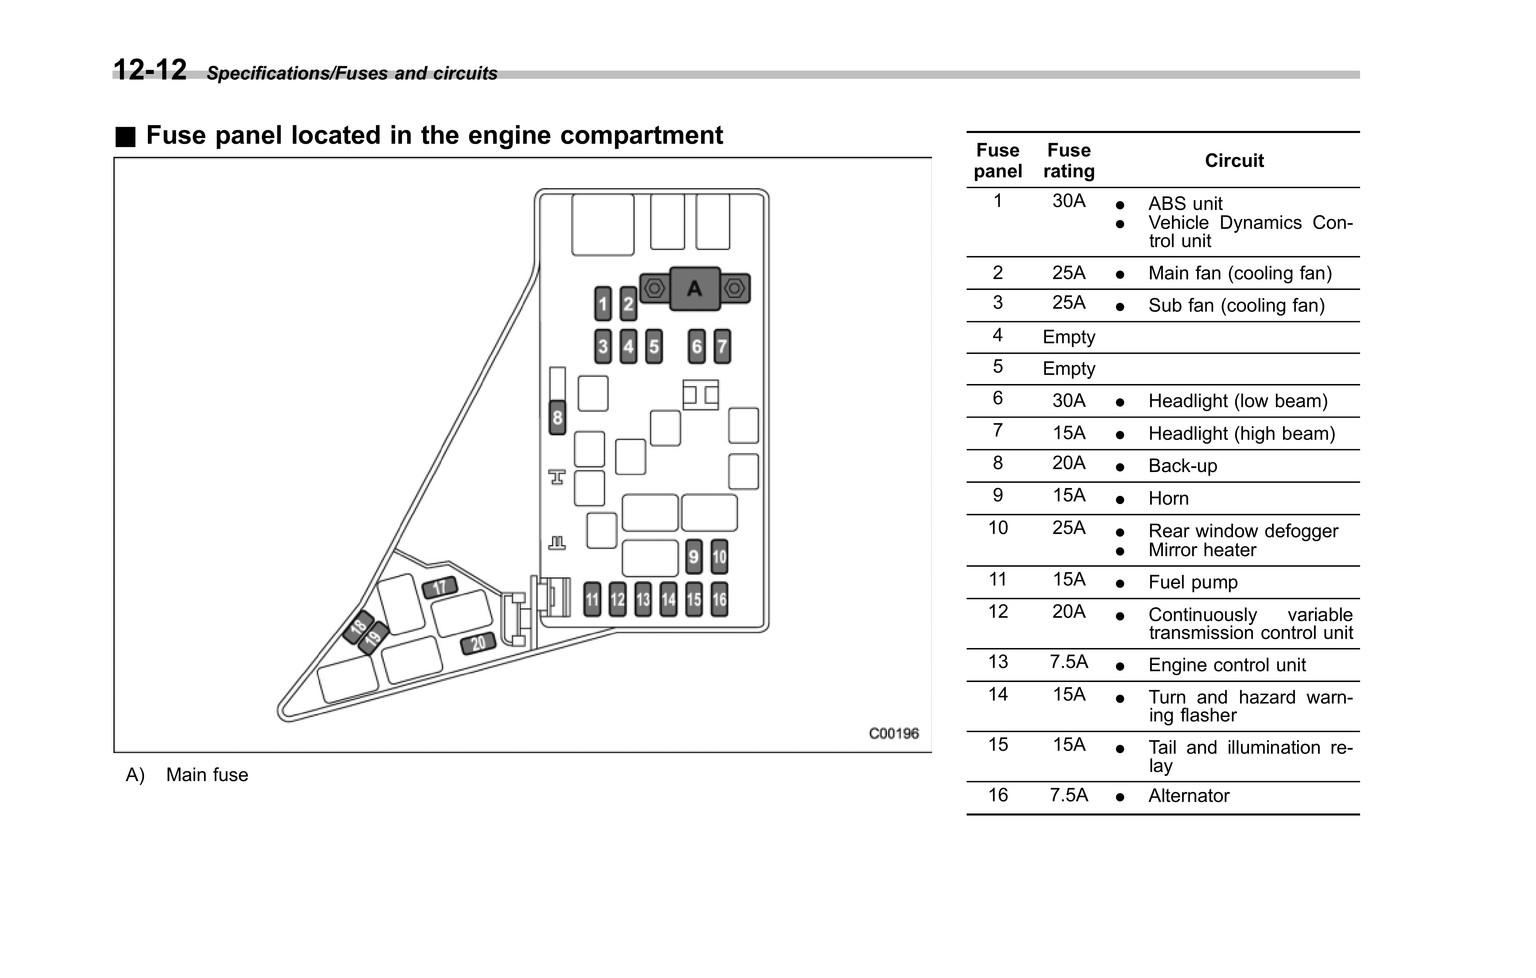 fuse box subaru forester 2006 to 8132  subaru crosstrek wiring diagram free diagram  subaru crosstrek wiring diagram free